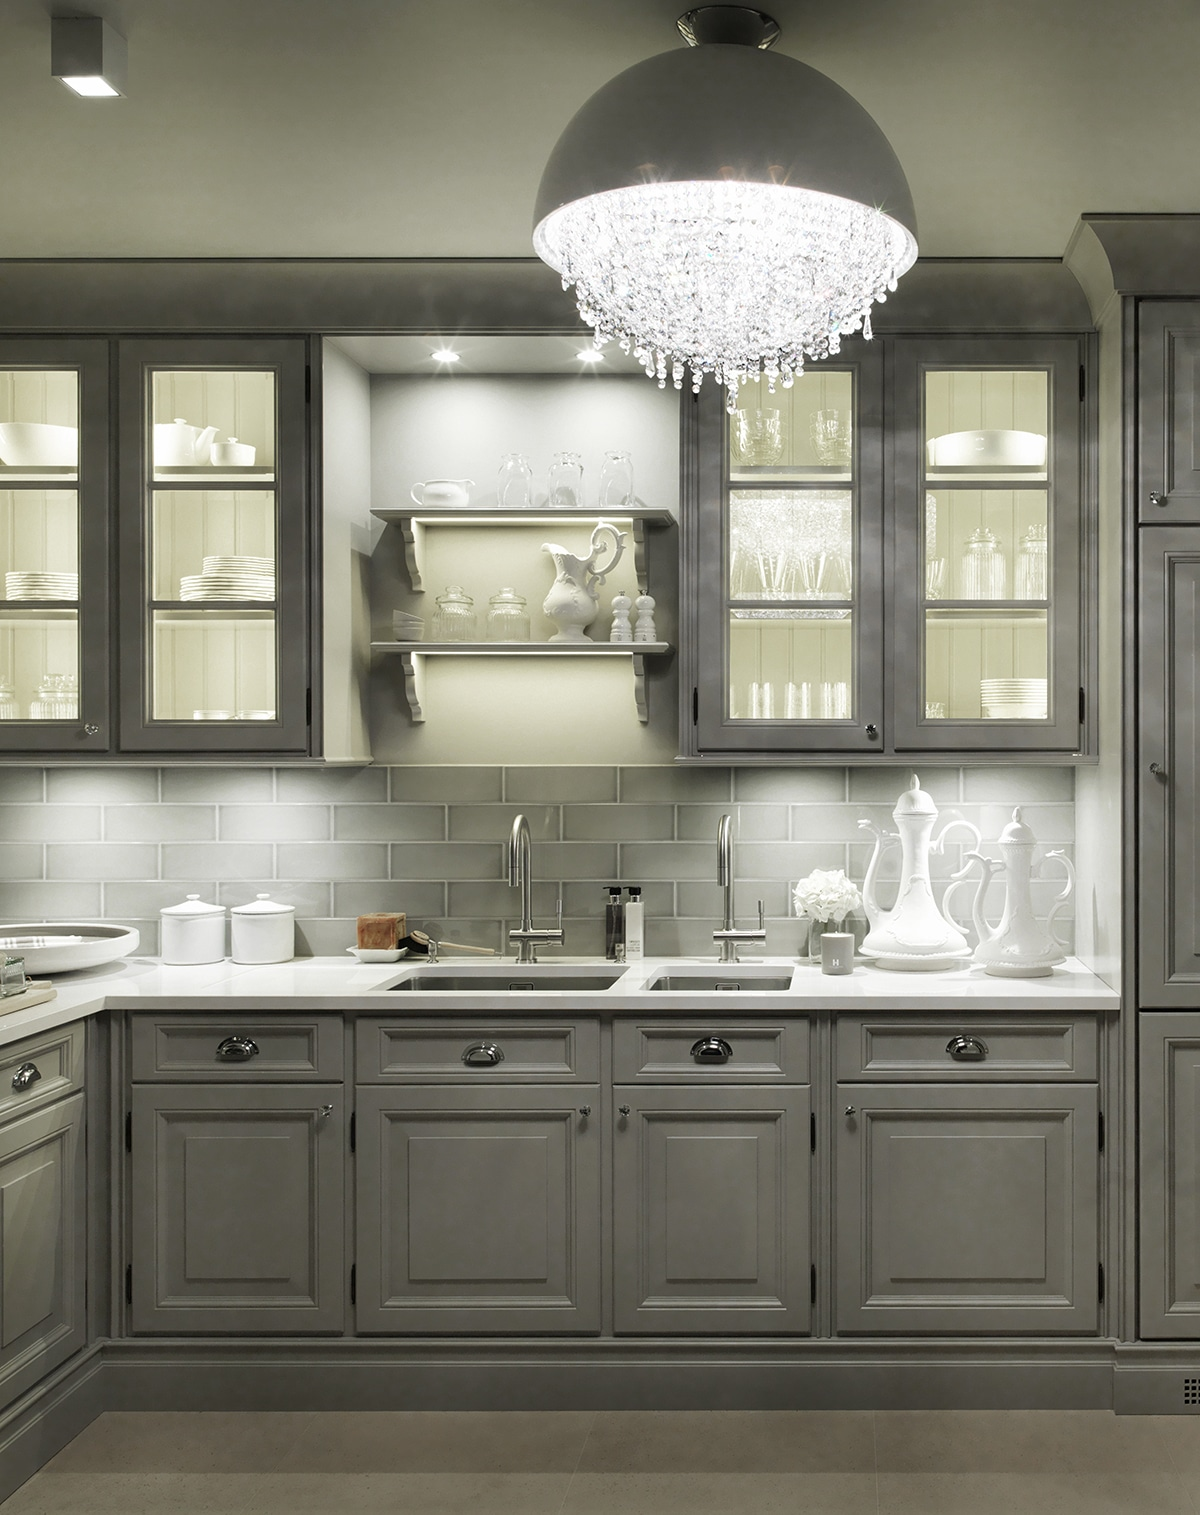 Interior Designer to the Stars - Luxury Lifestyle